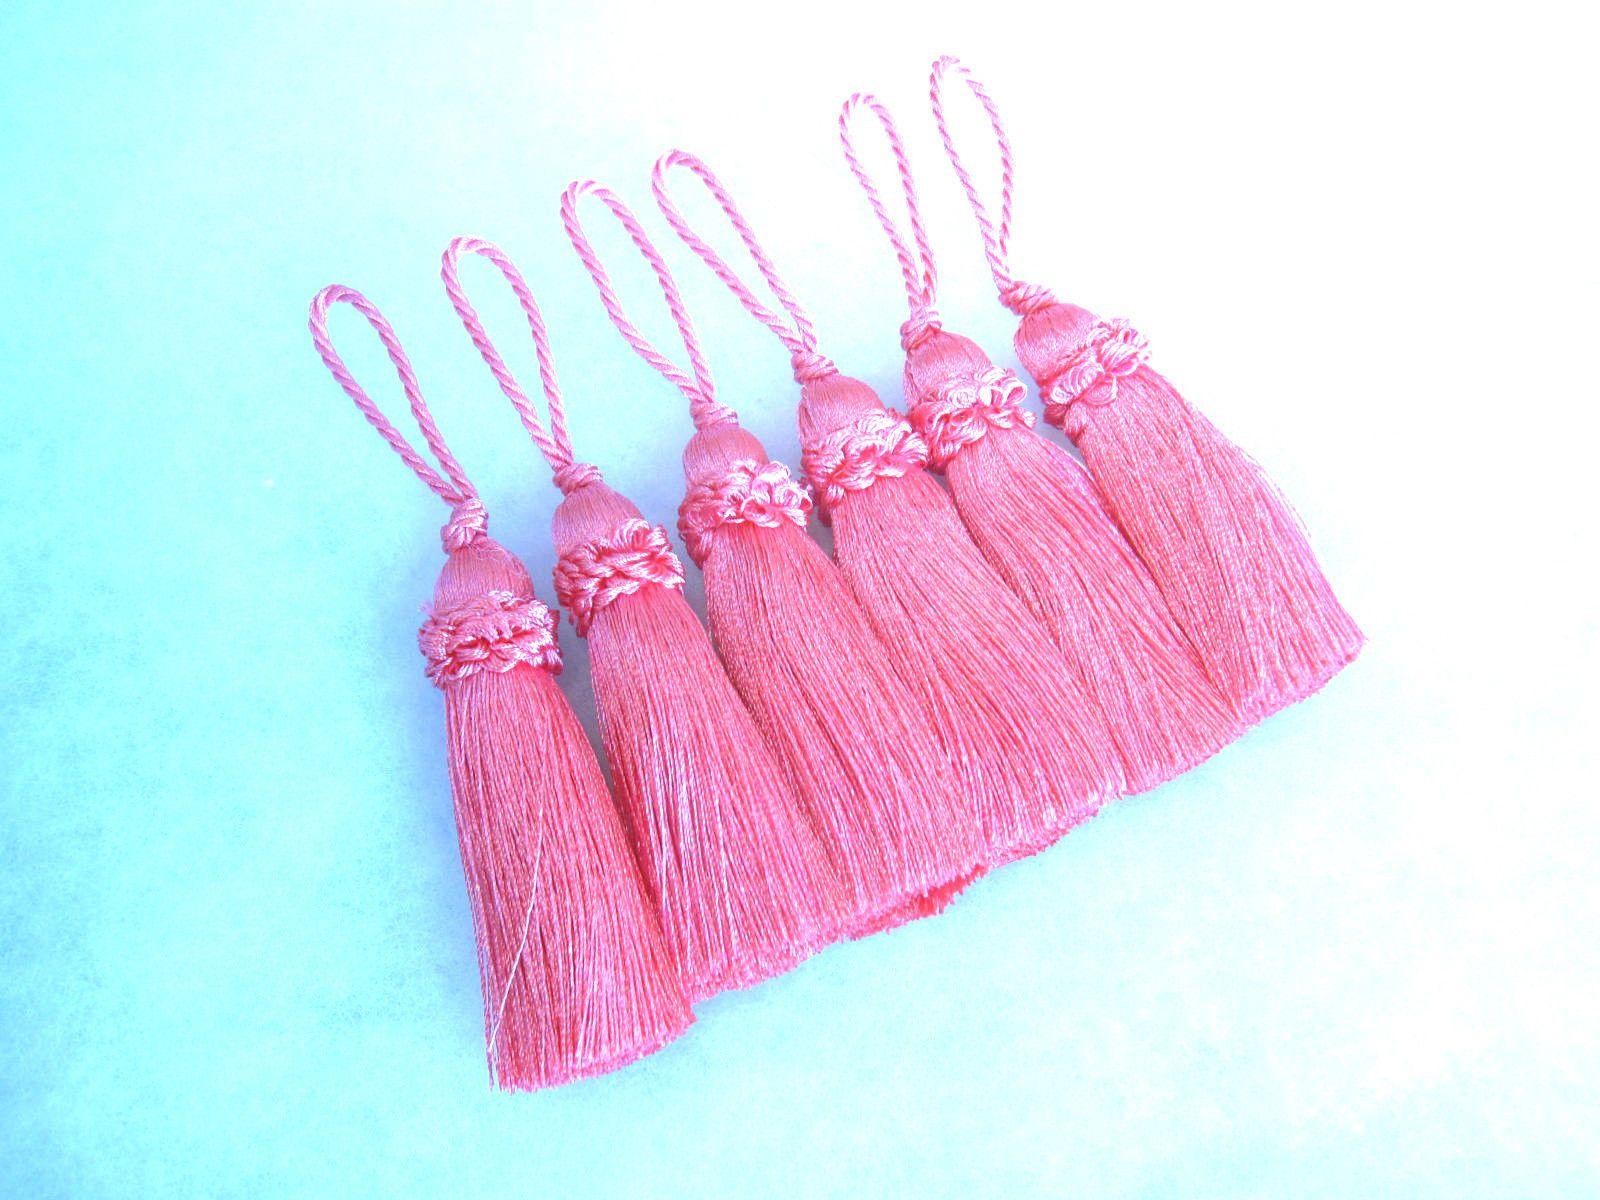 6 Pink Key Tassel 10cm Loop Luxury Blind Cushion Curtain Or Fabric Trim